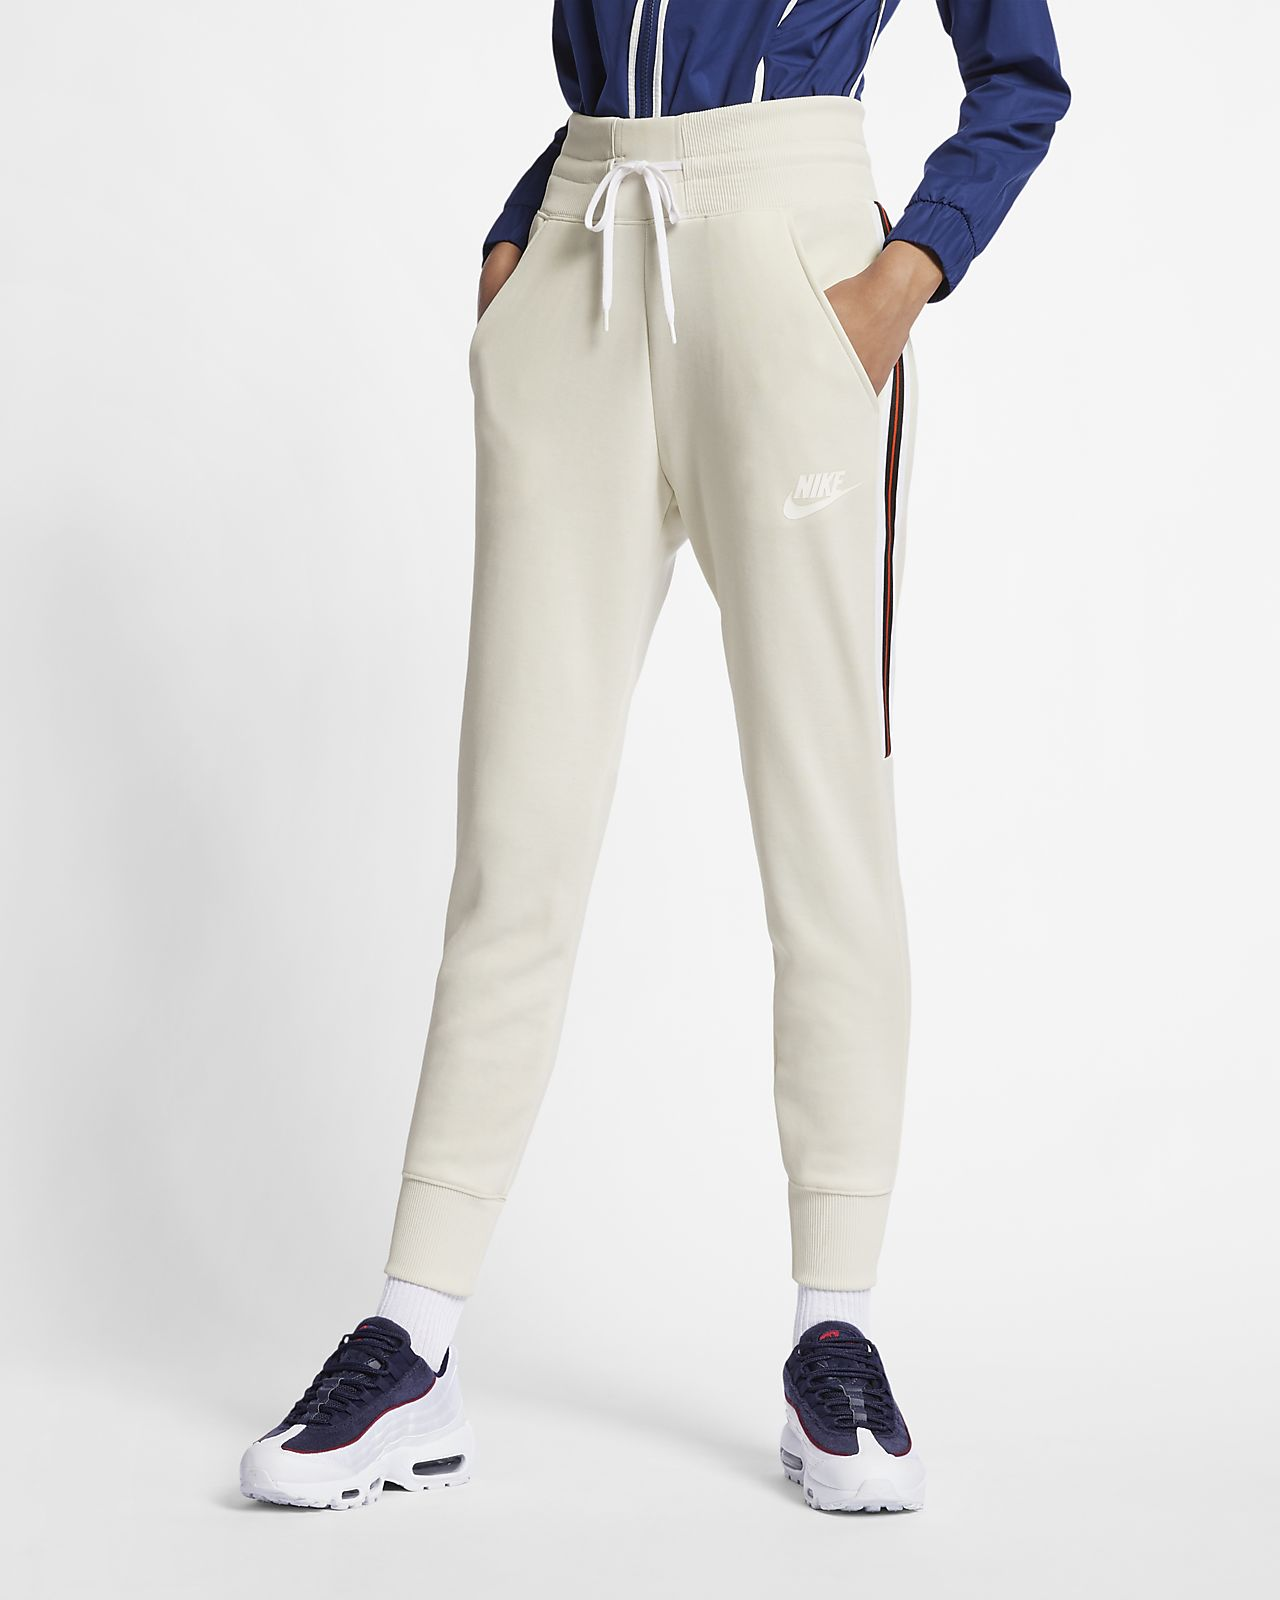 Pantalones Para De Sportswear Mujer Mx Entrenamiento 8Ixwq7B4XX